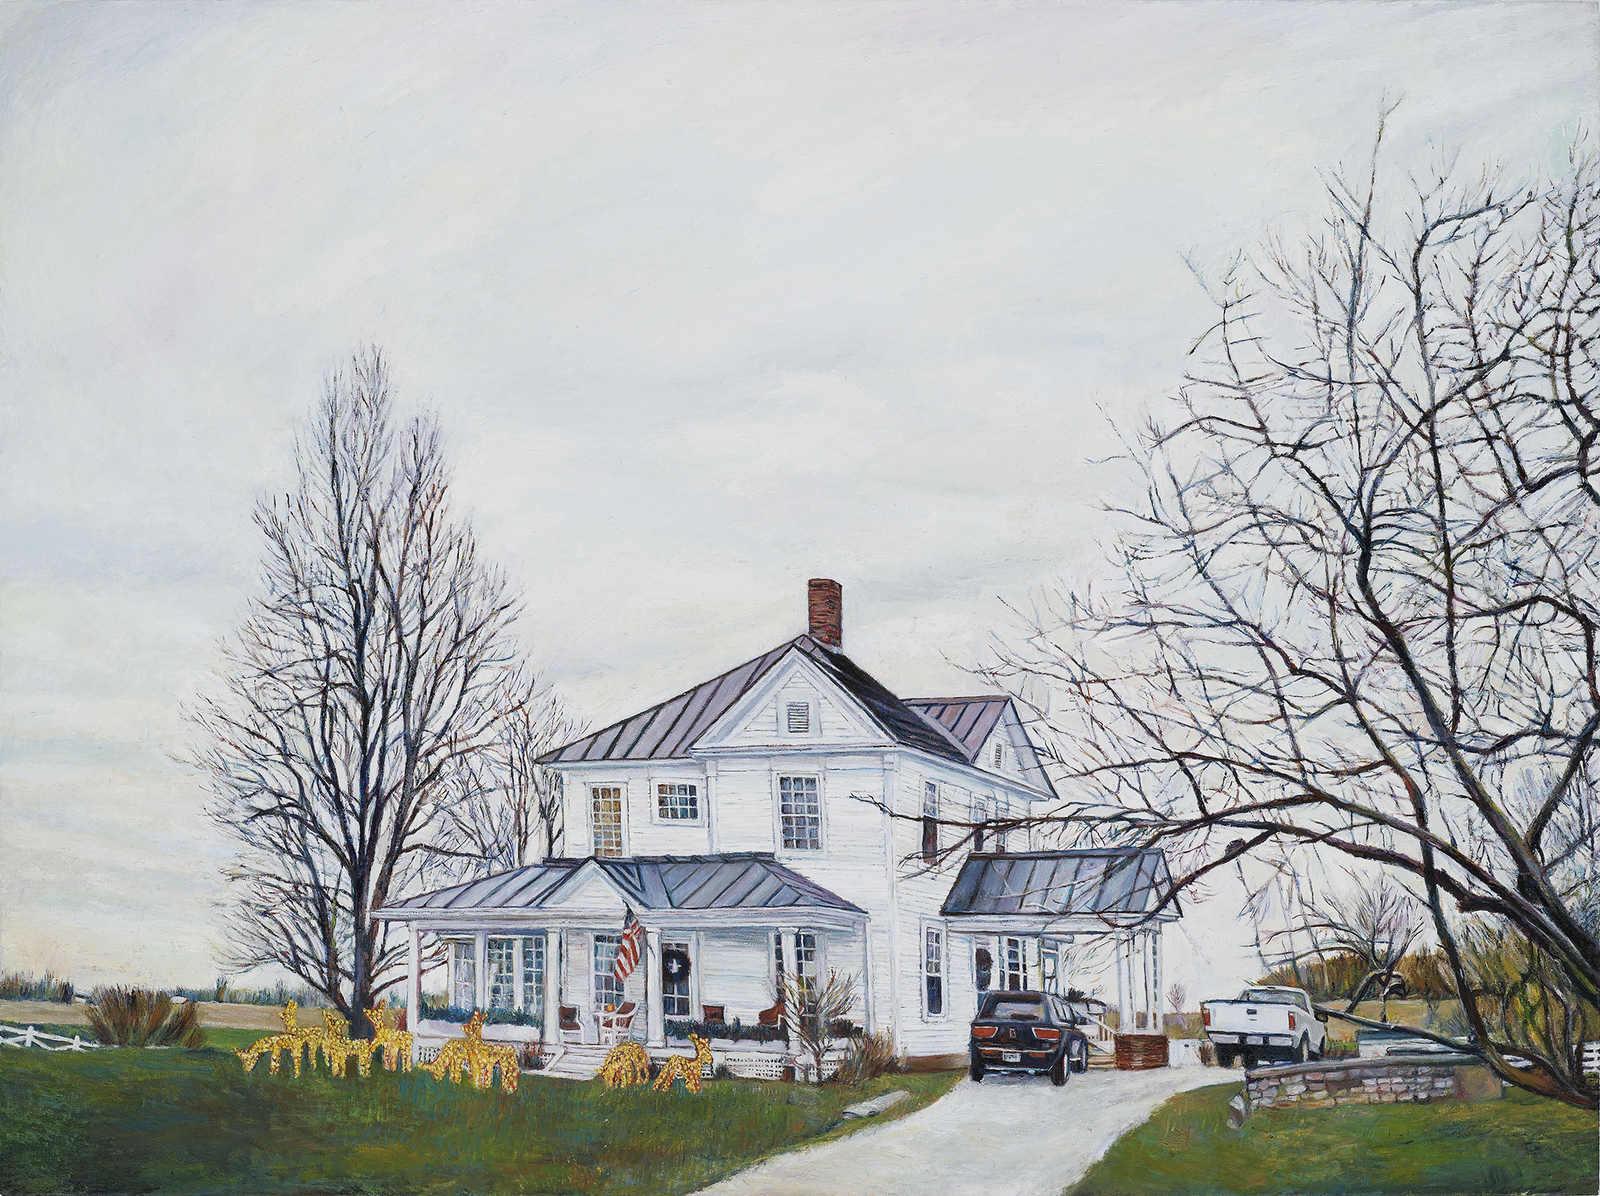 James Dean's Family Farmhouse